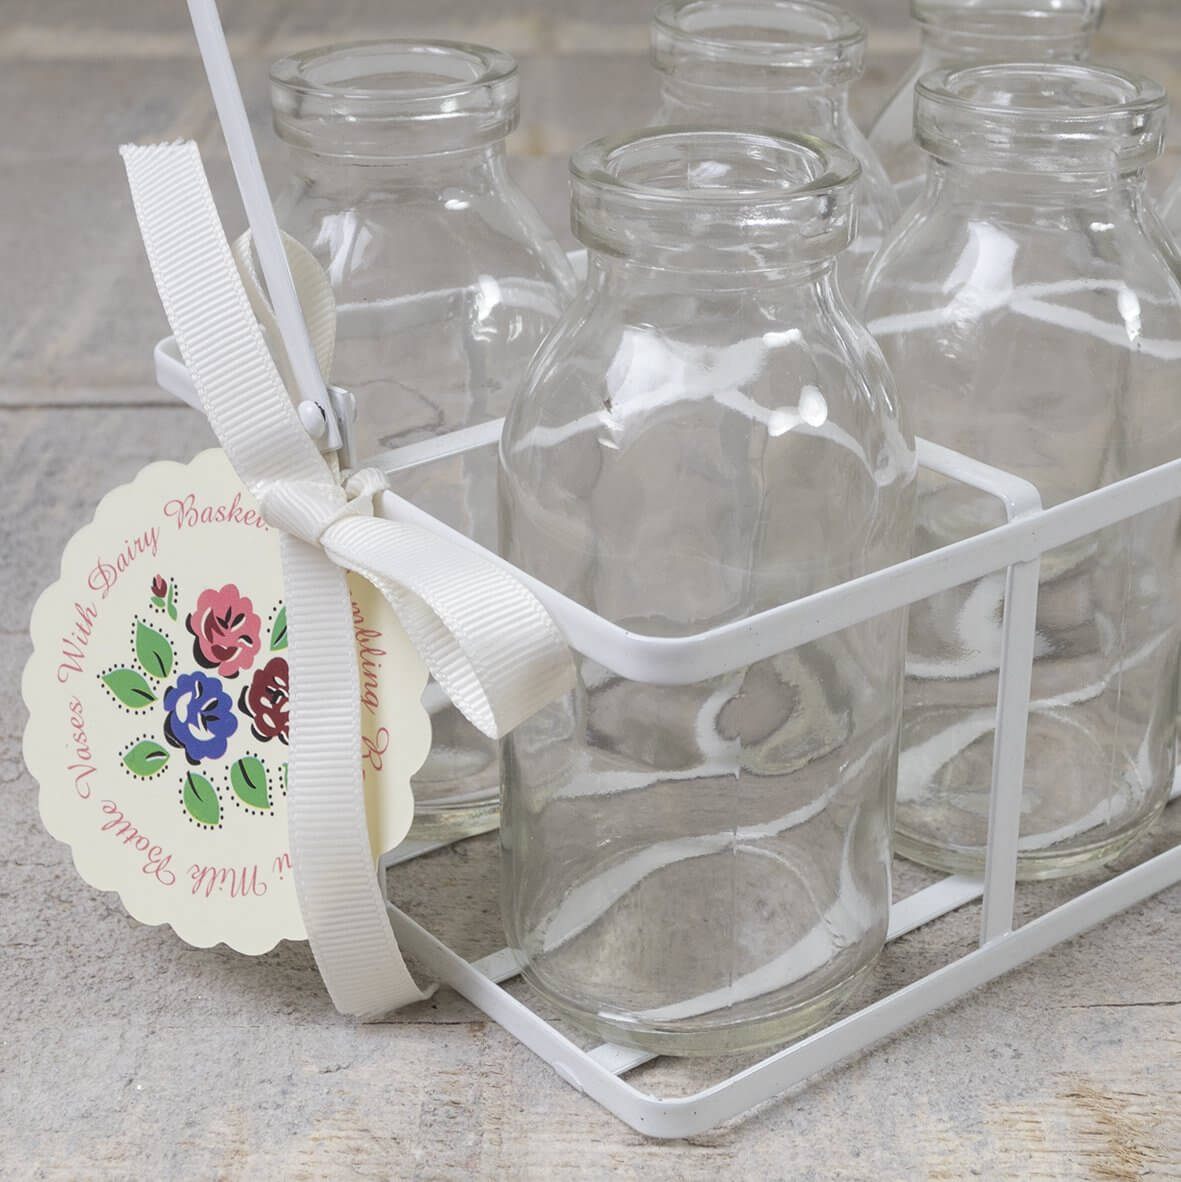 School Milk Bottles in Carry Crate - Detail